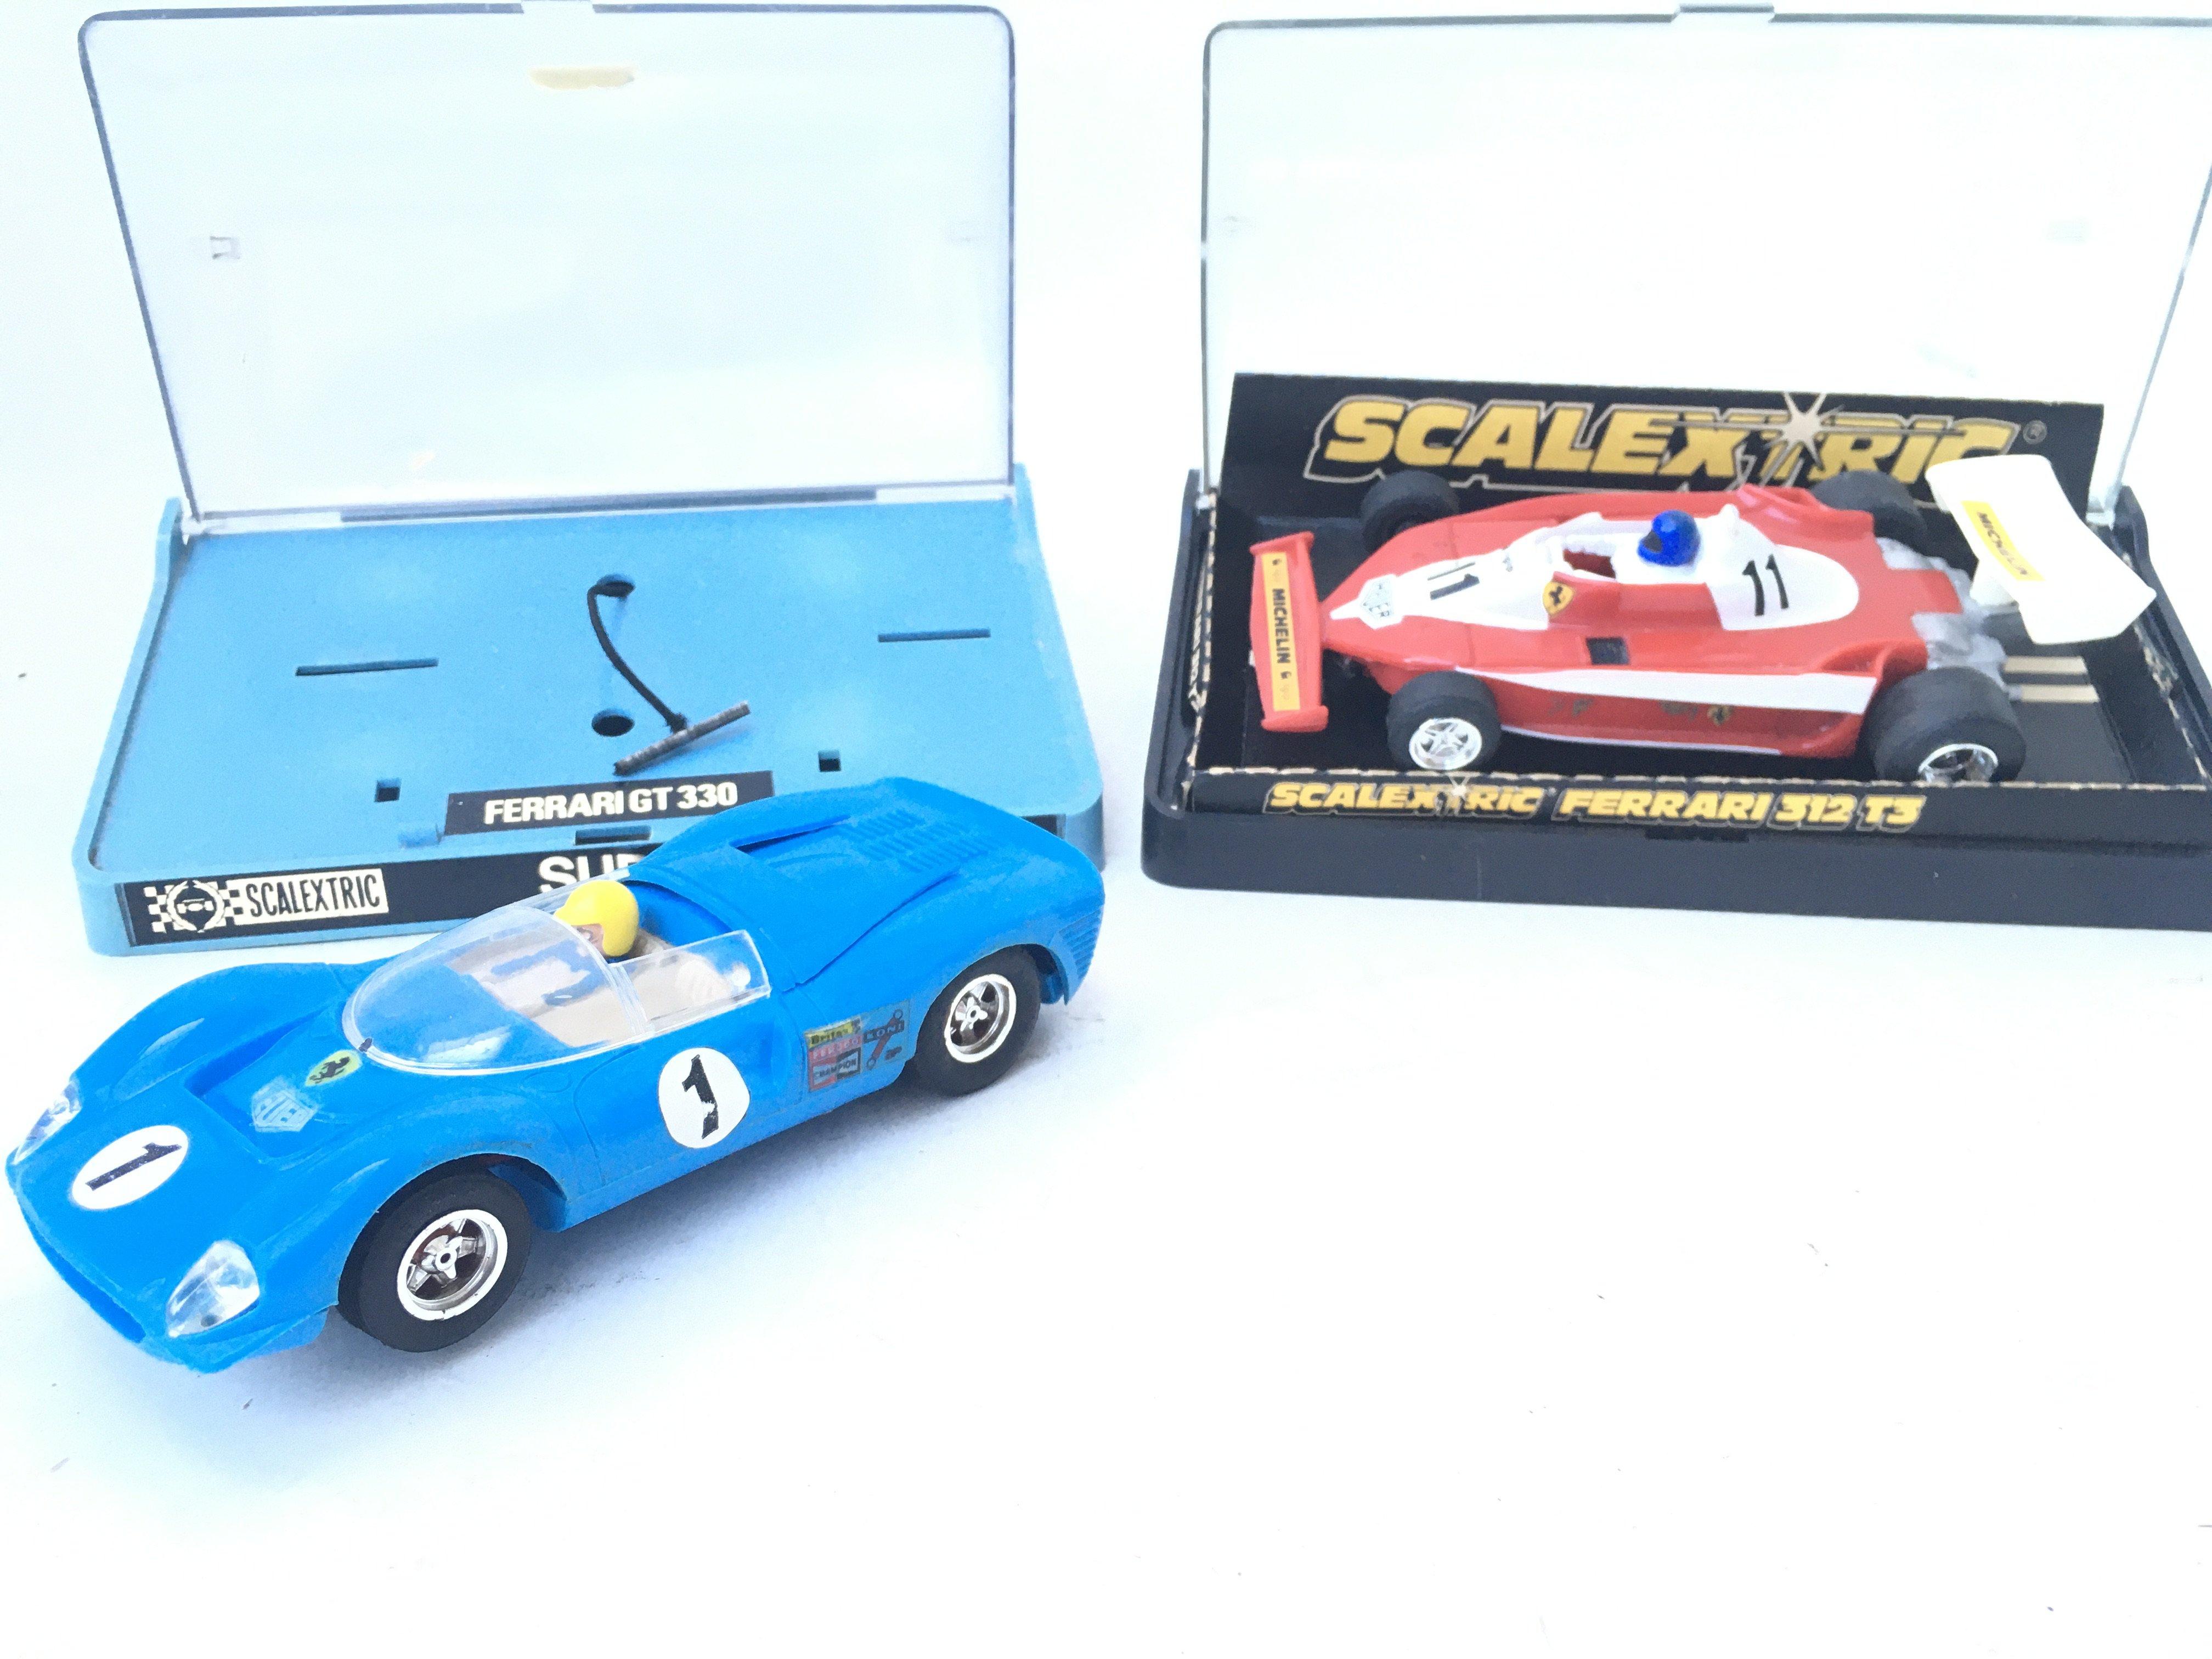 2 X Boxed Scalextric Ferrari GT 330 and Ferrari 312 T3 both boxed.